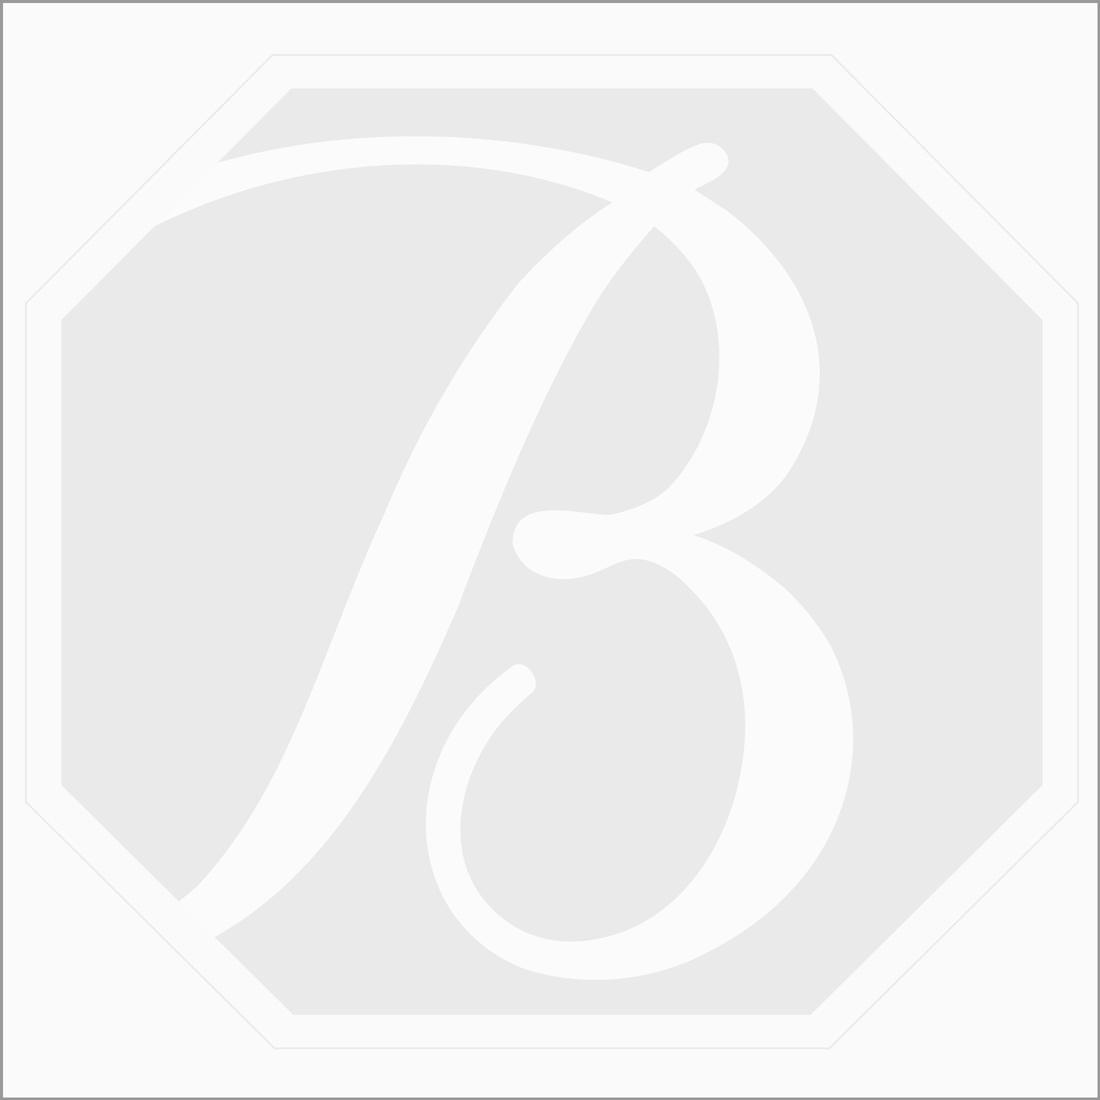 0.73 ct. Oval (H-VVS2) White Rose Cut Diamond Photograph